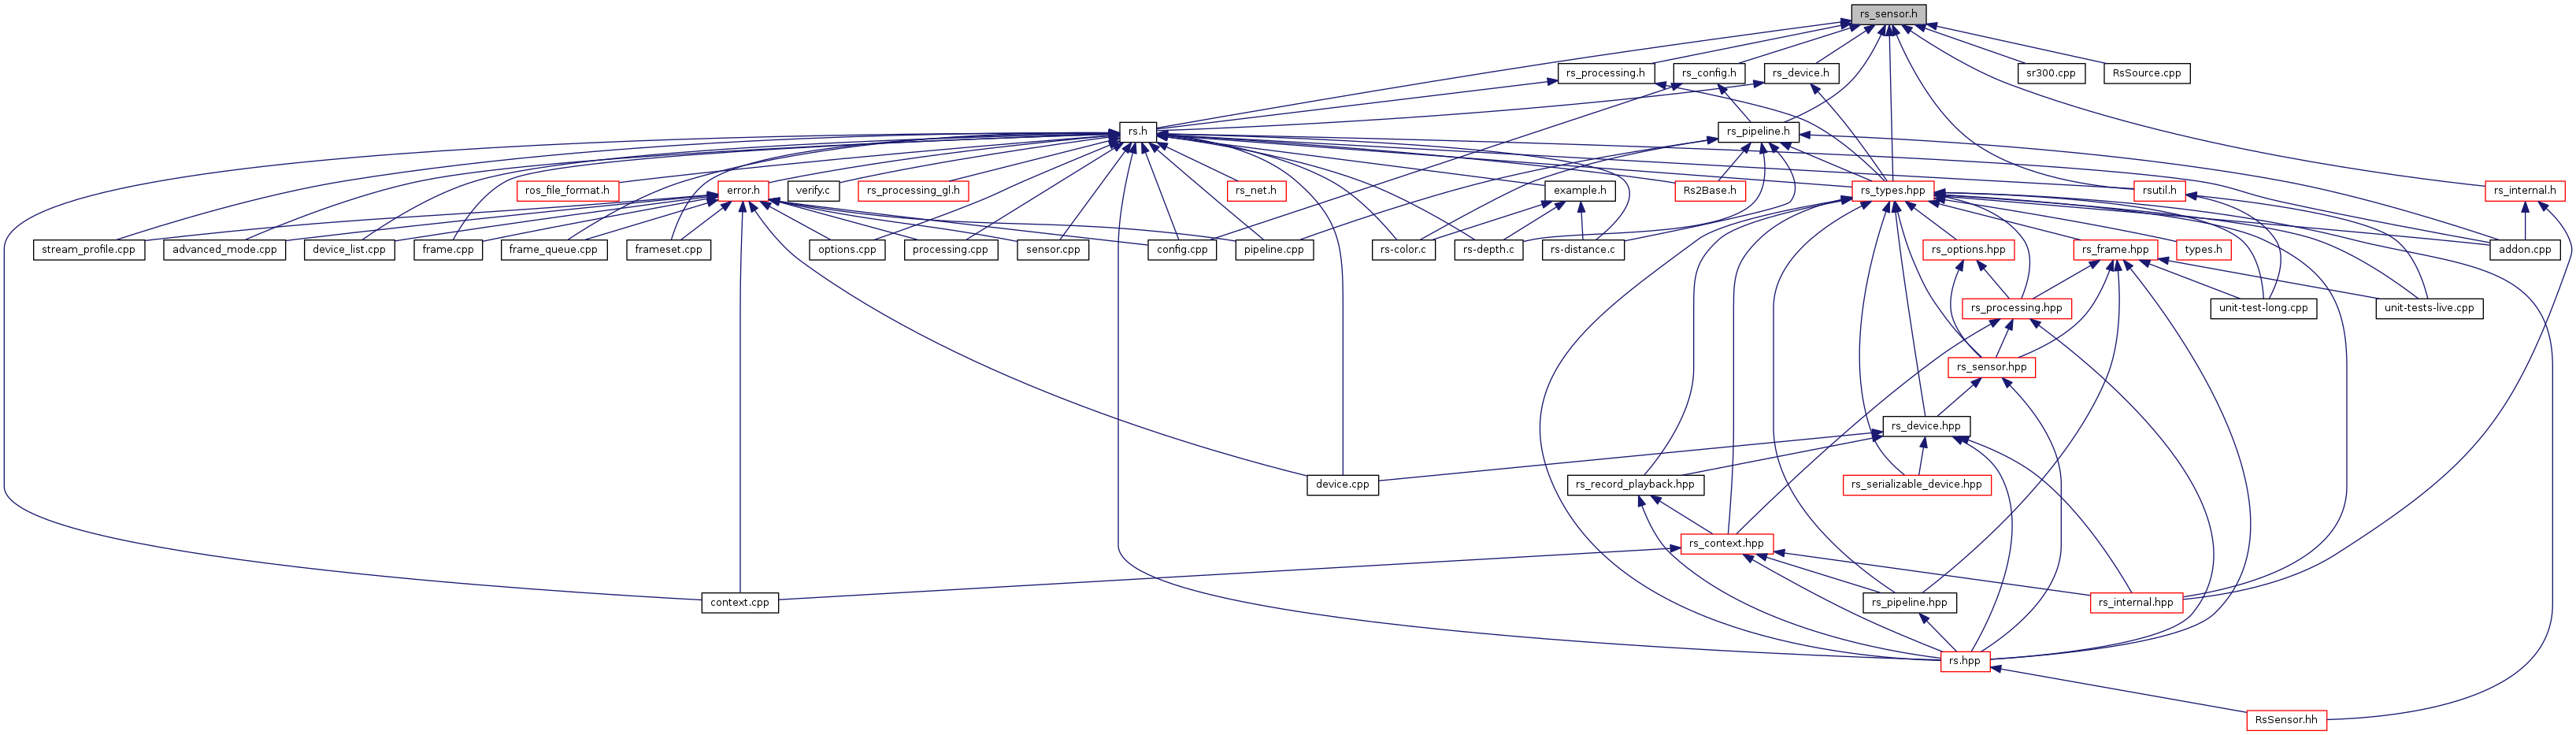 librealsense2: rs_sensor h File Reference